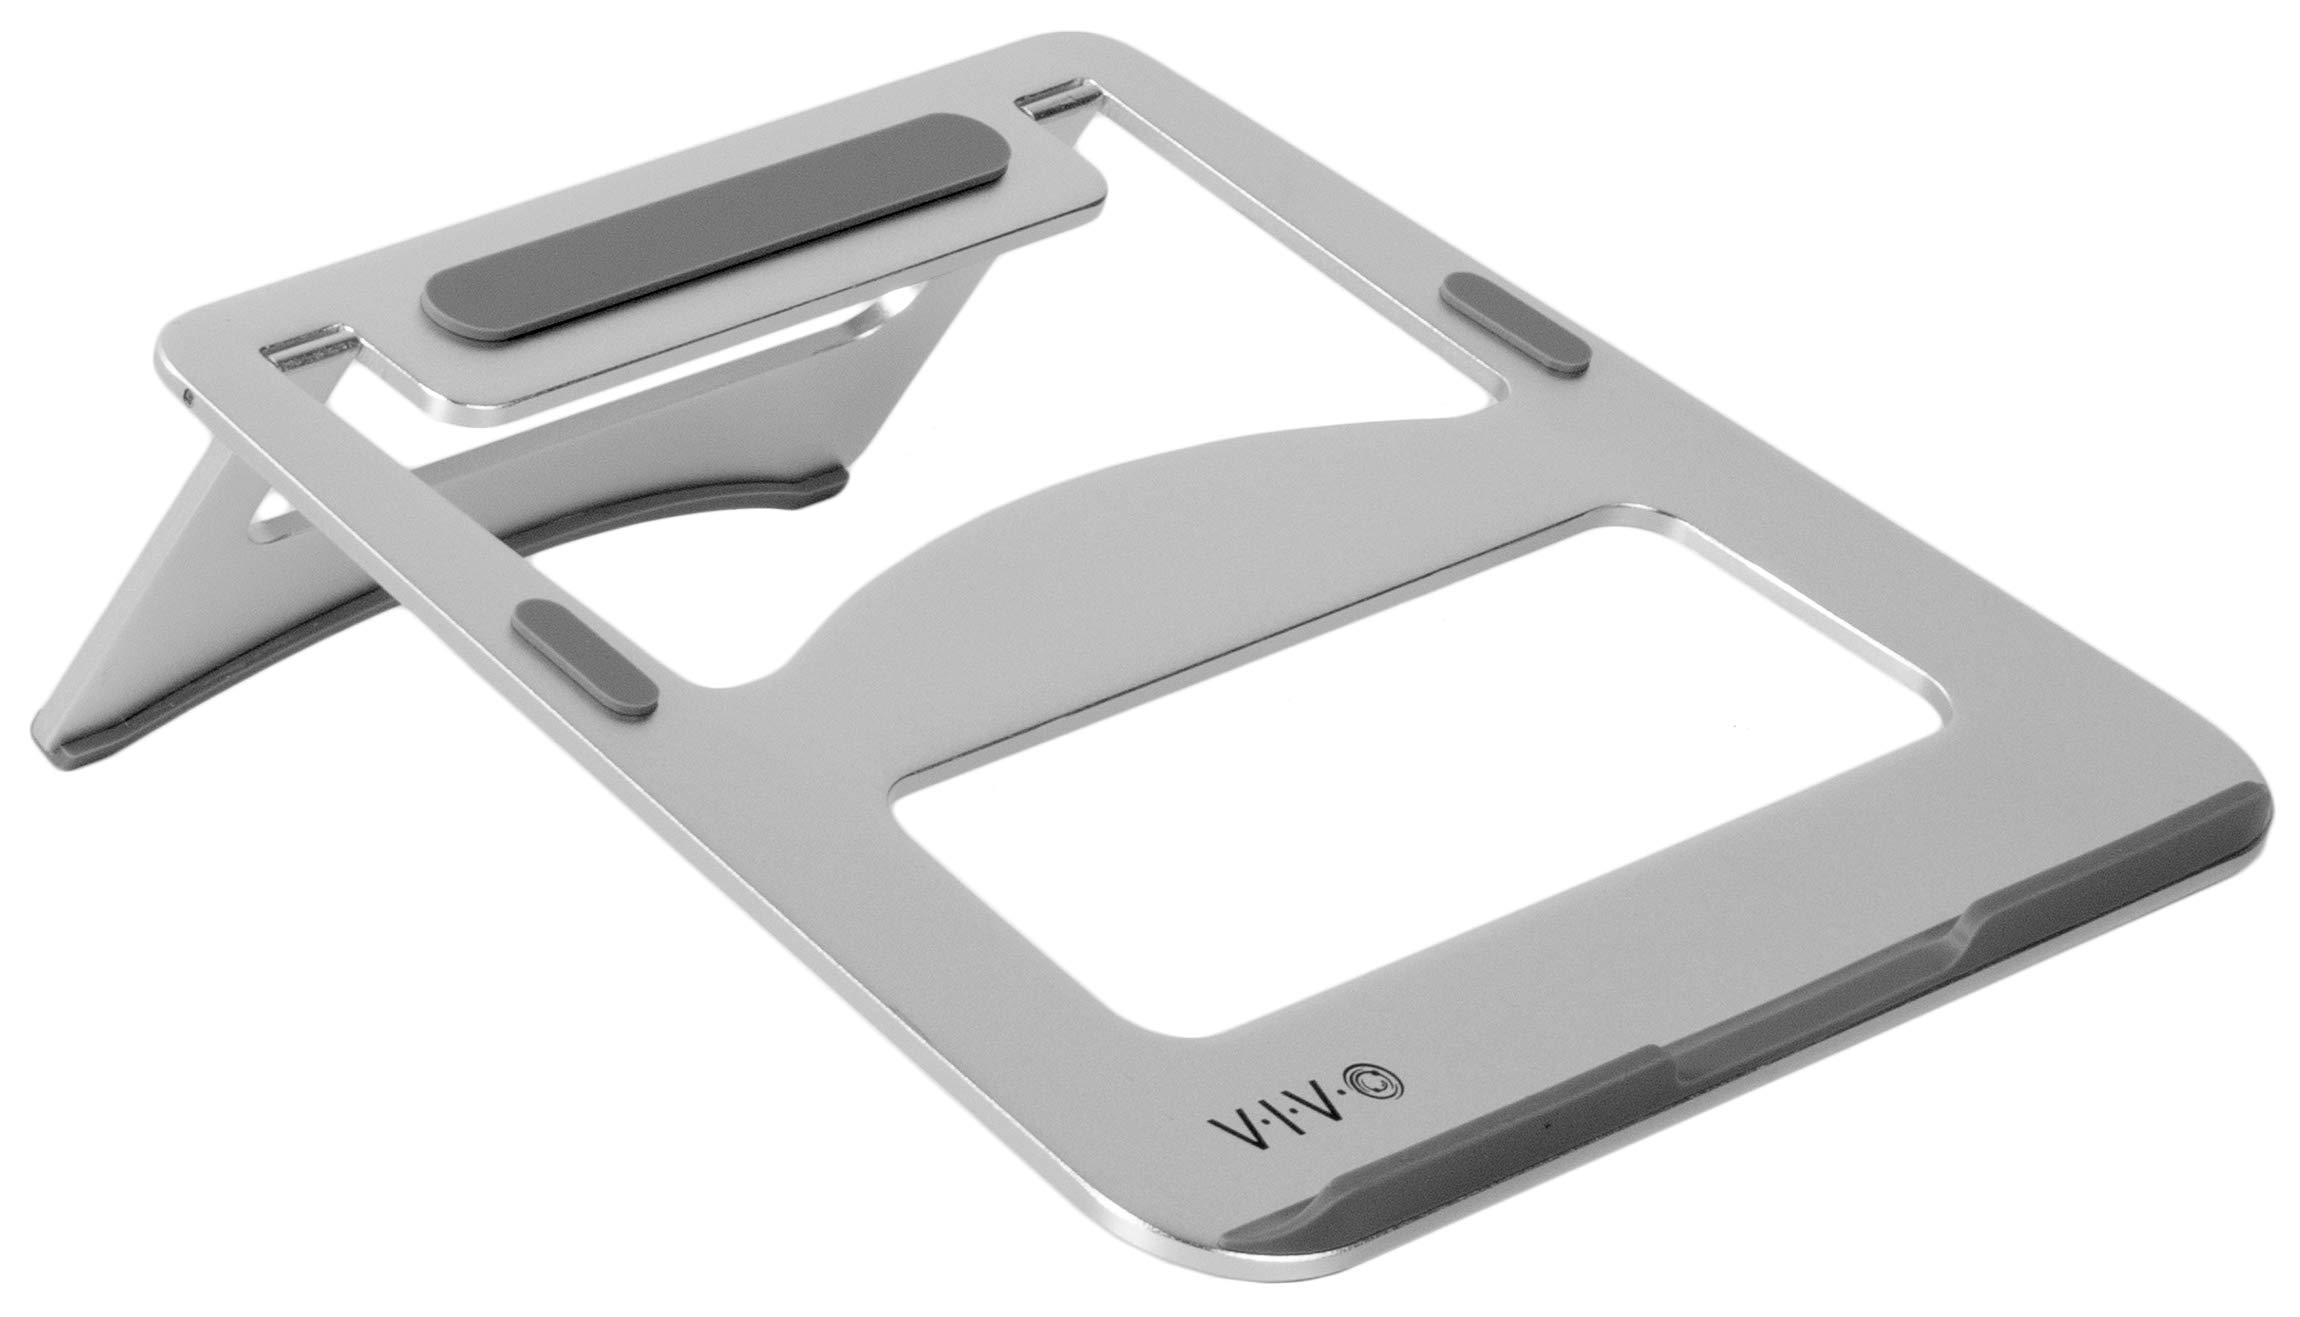 "VIVO Aluminum Portable Folding Ultra-Slim Laptop Notebook Desk Stand | Ergonomic Tilting Tablet Riser for Screens up to 15"" (STAND-V000J)"